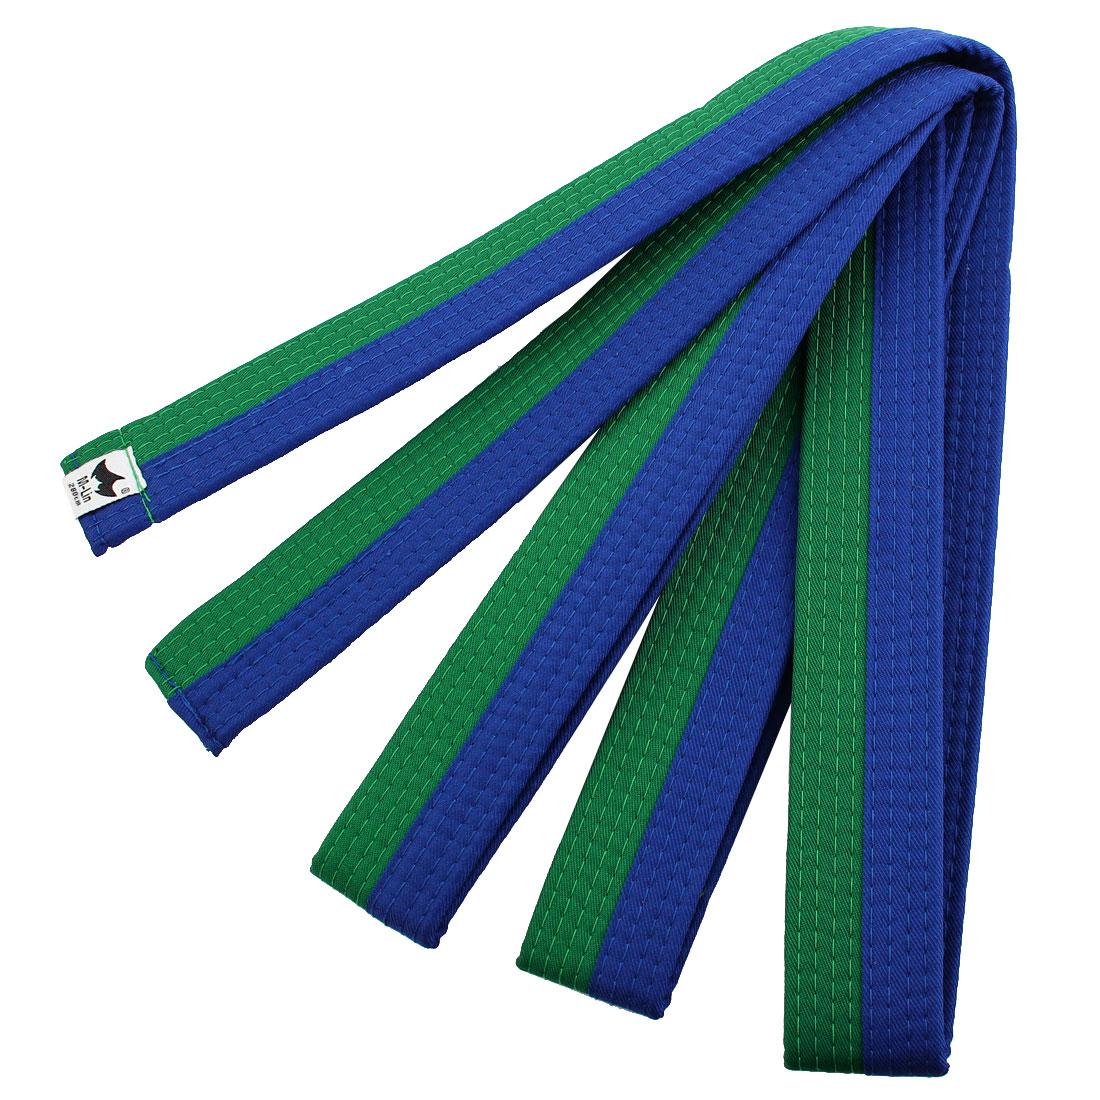 Sporty Rank Hapkido Taekwondo Belt Judo Karate Band Green Blue